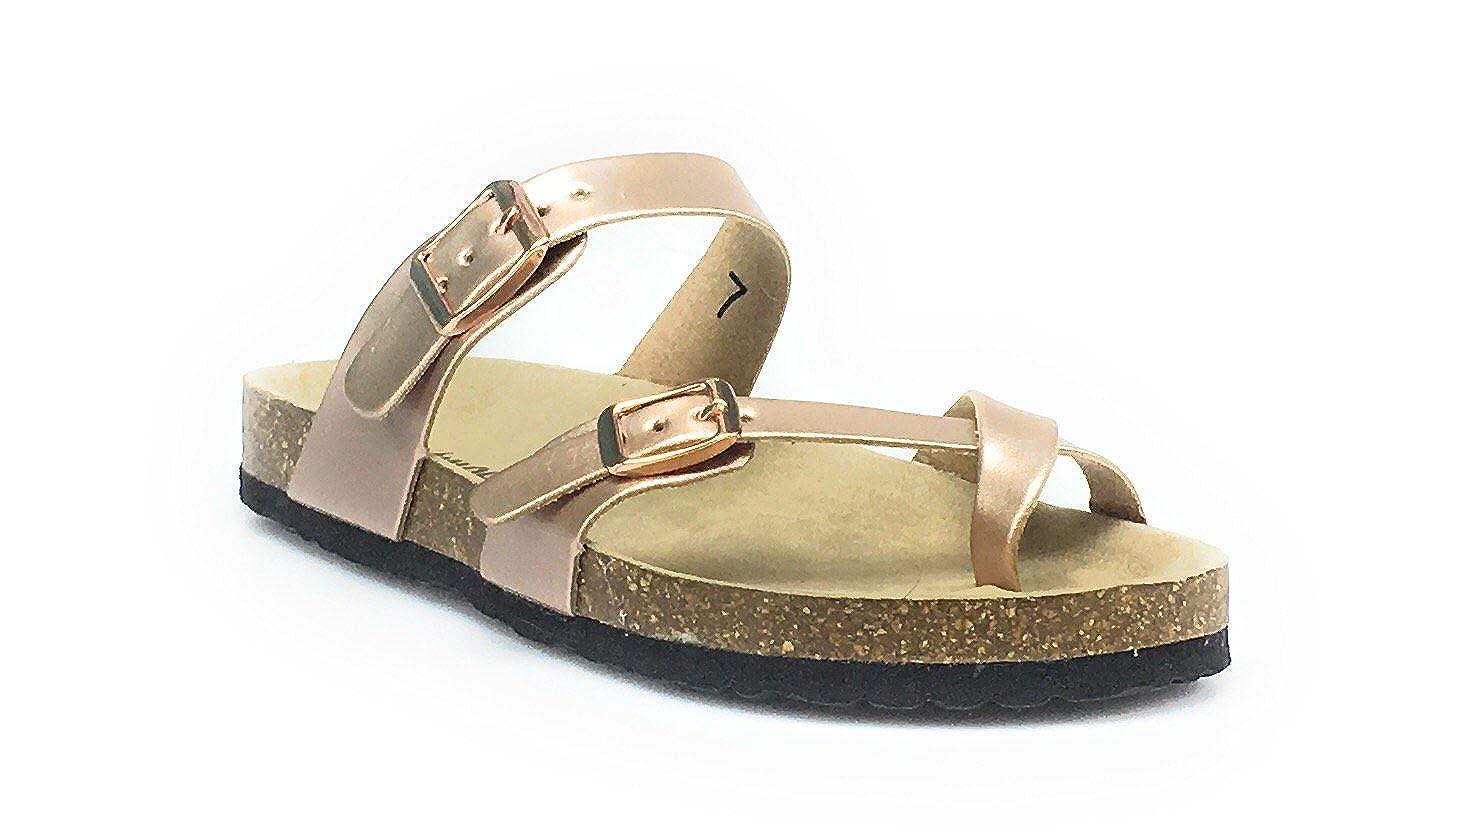 bb83a3c3a37d OUTWOODS Women s Bork-30 Vegan Leather Adjustable Strap Toe-Loop Buckle  Flats Sandals (6